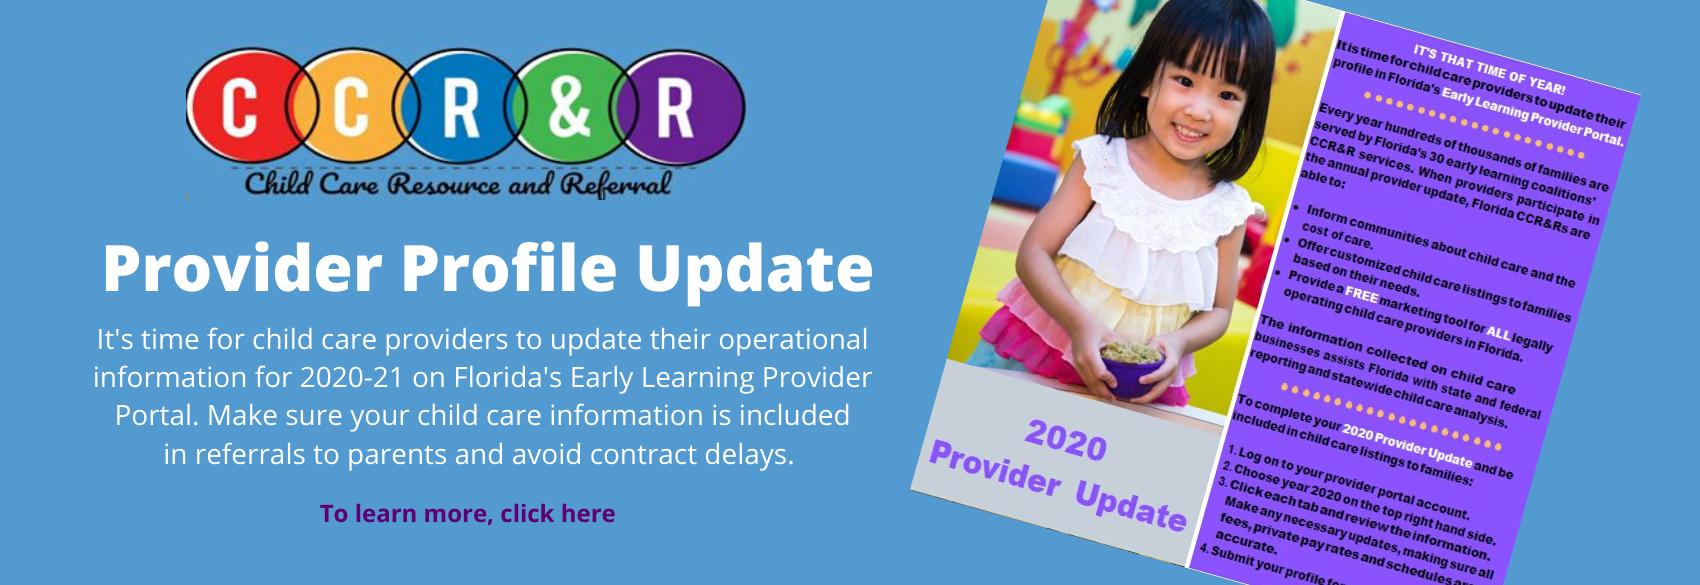 CCRR Provider Profile Update 2020